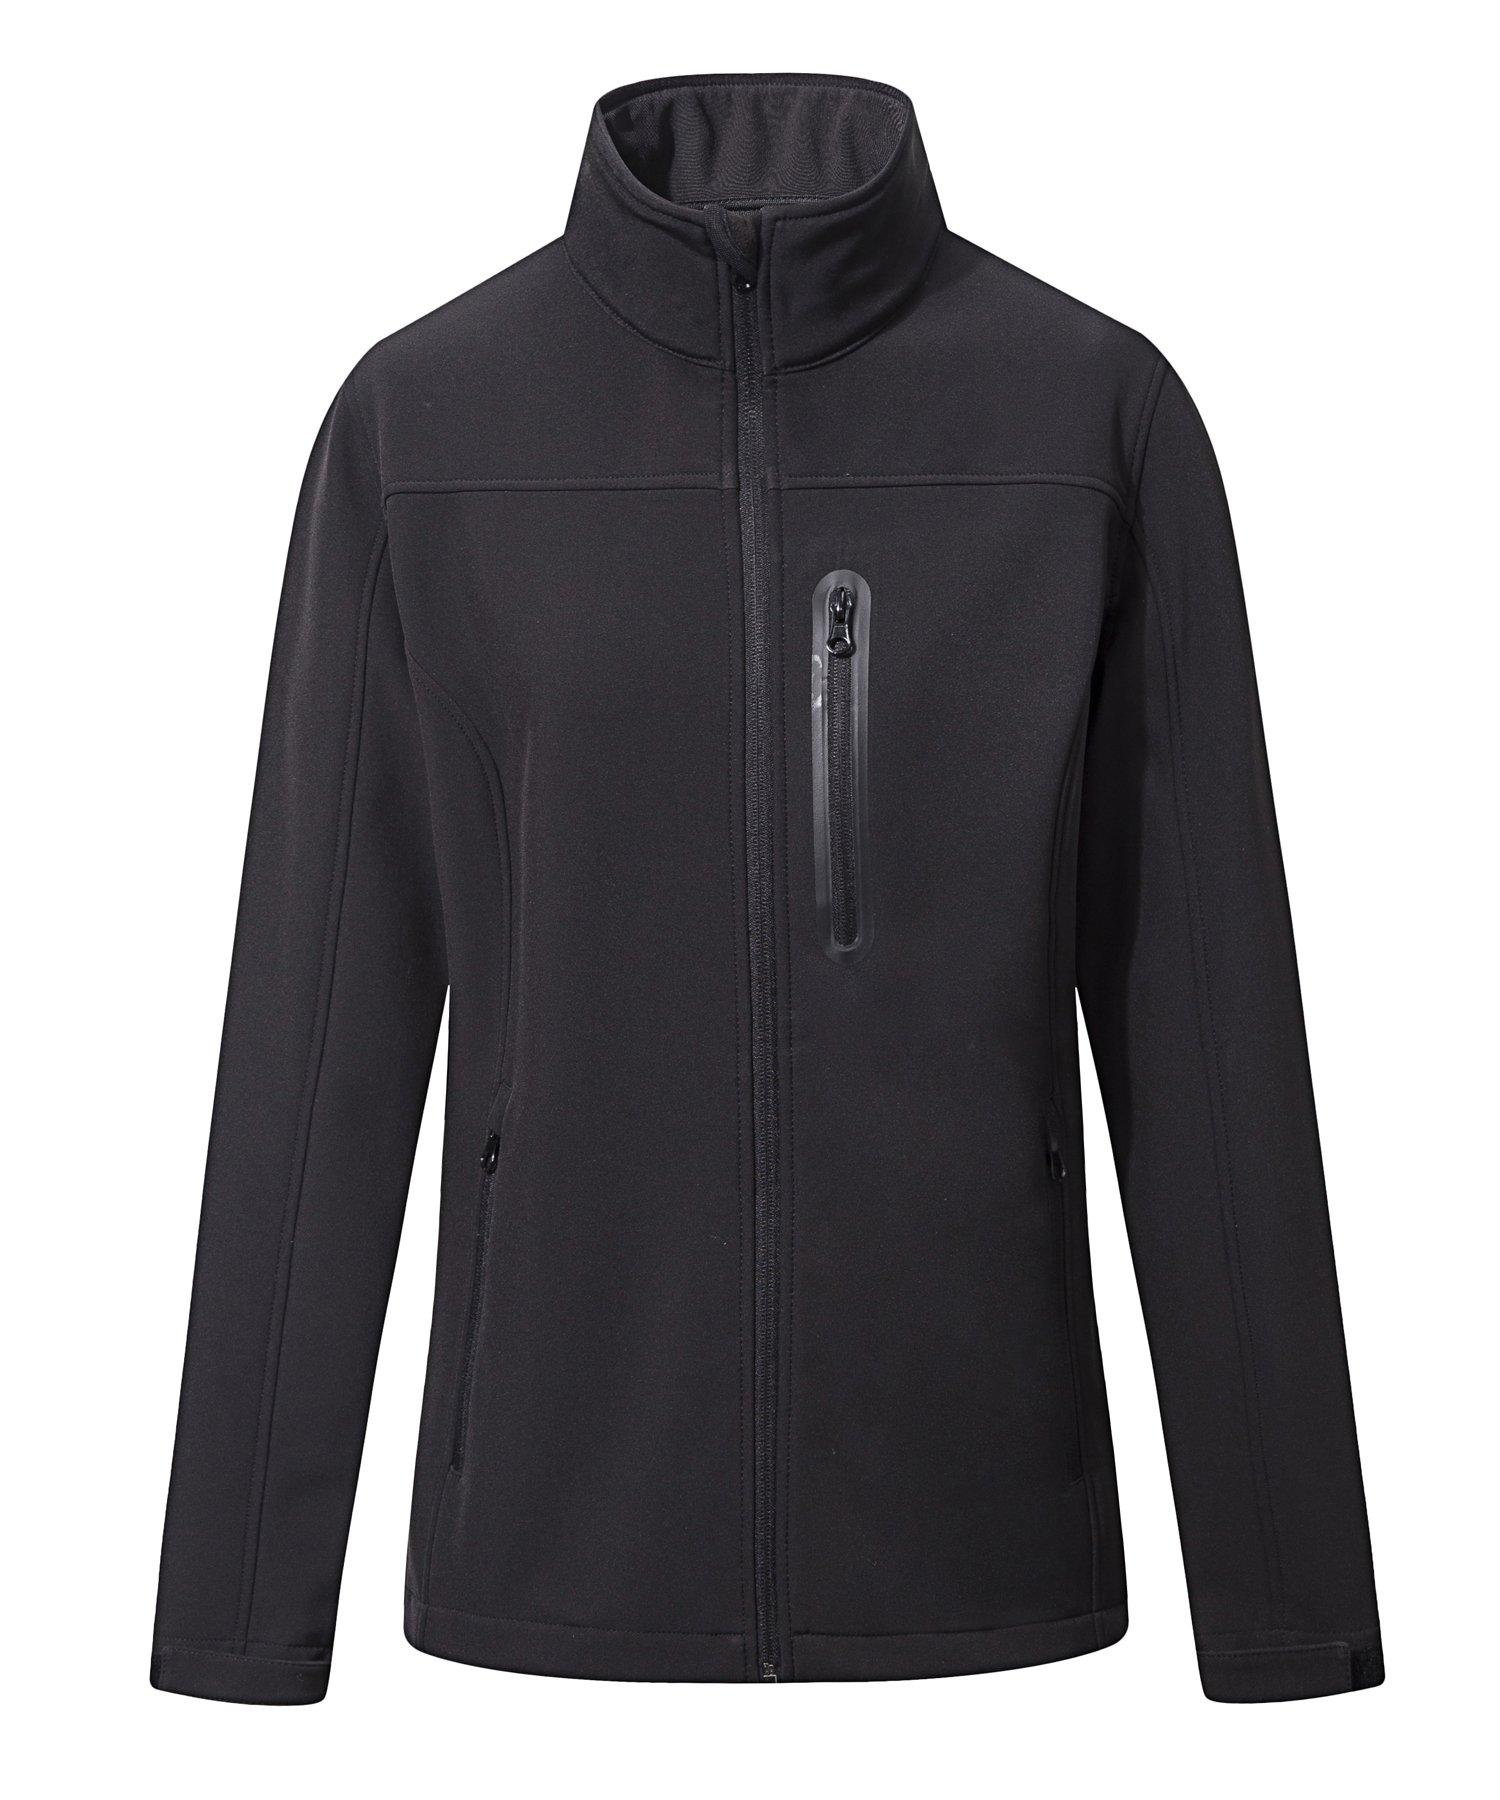 SPECIALMAGIC Women's Waterproof Outdoor Running Biking Jacket Cycling Softshell Black L